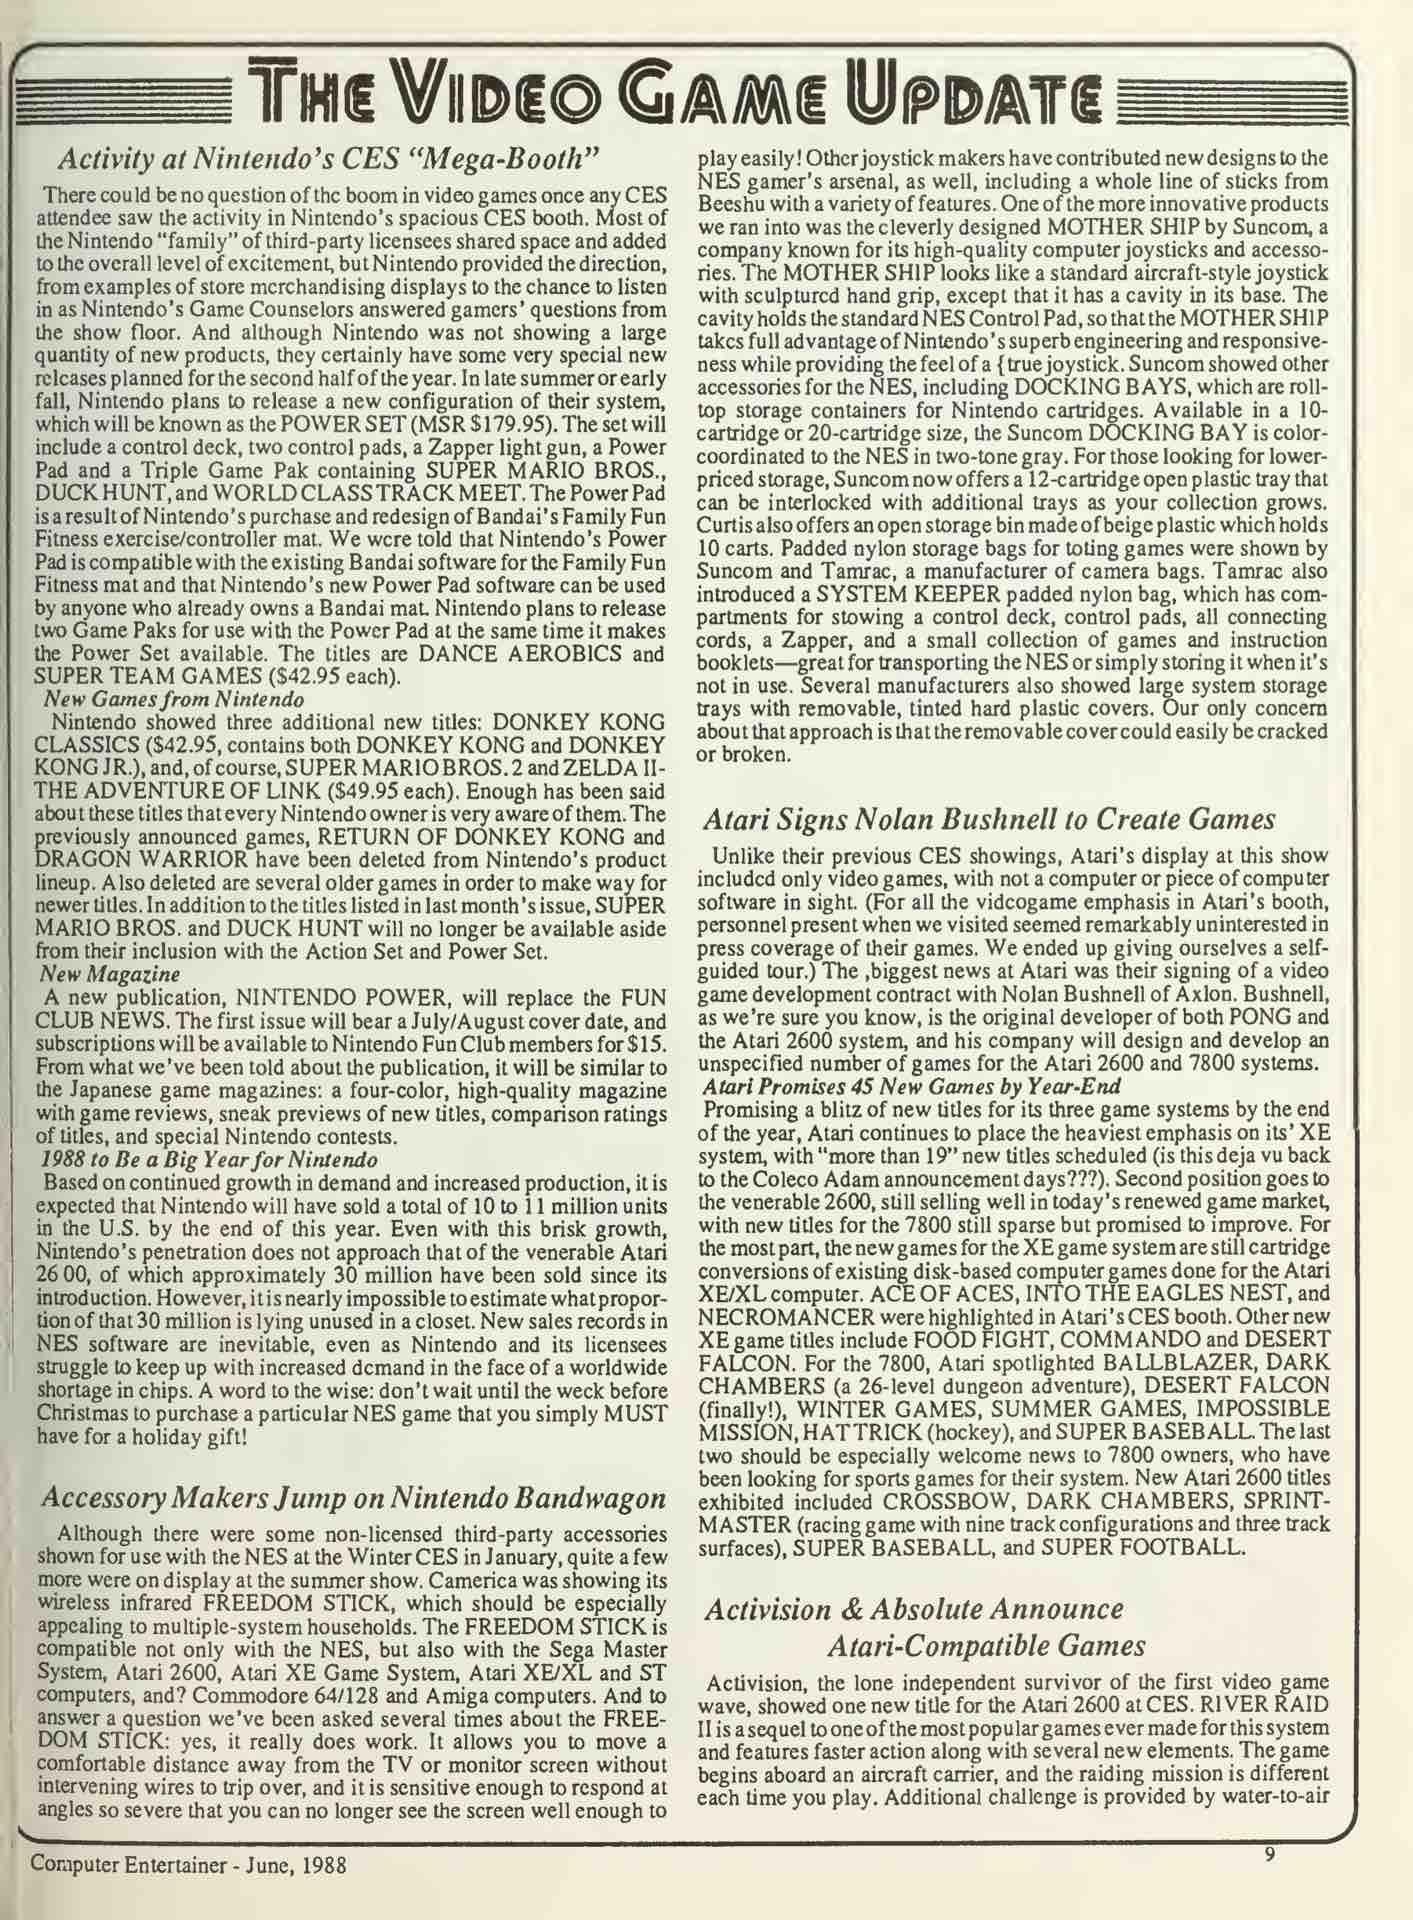 Computer Entertainer - June 1988 - pg 9